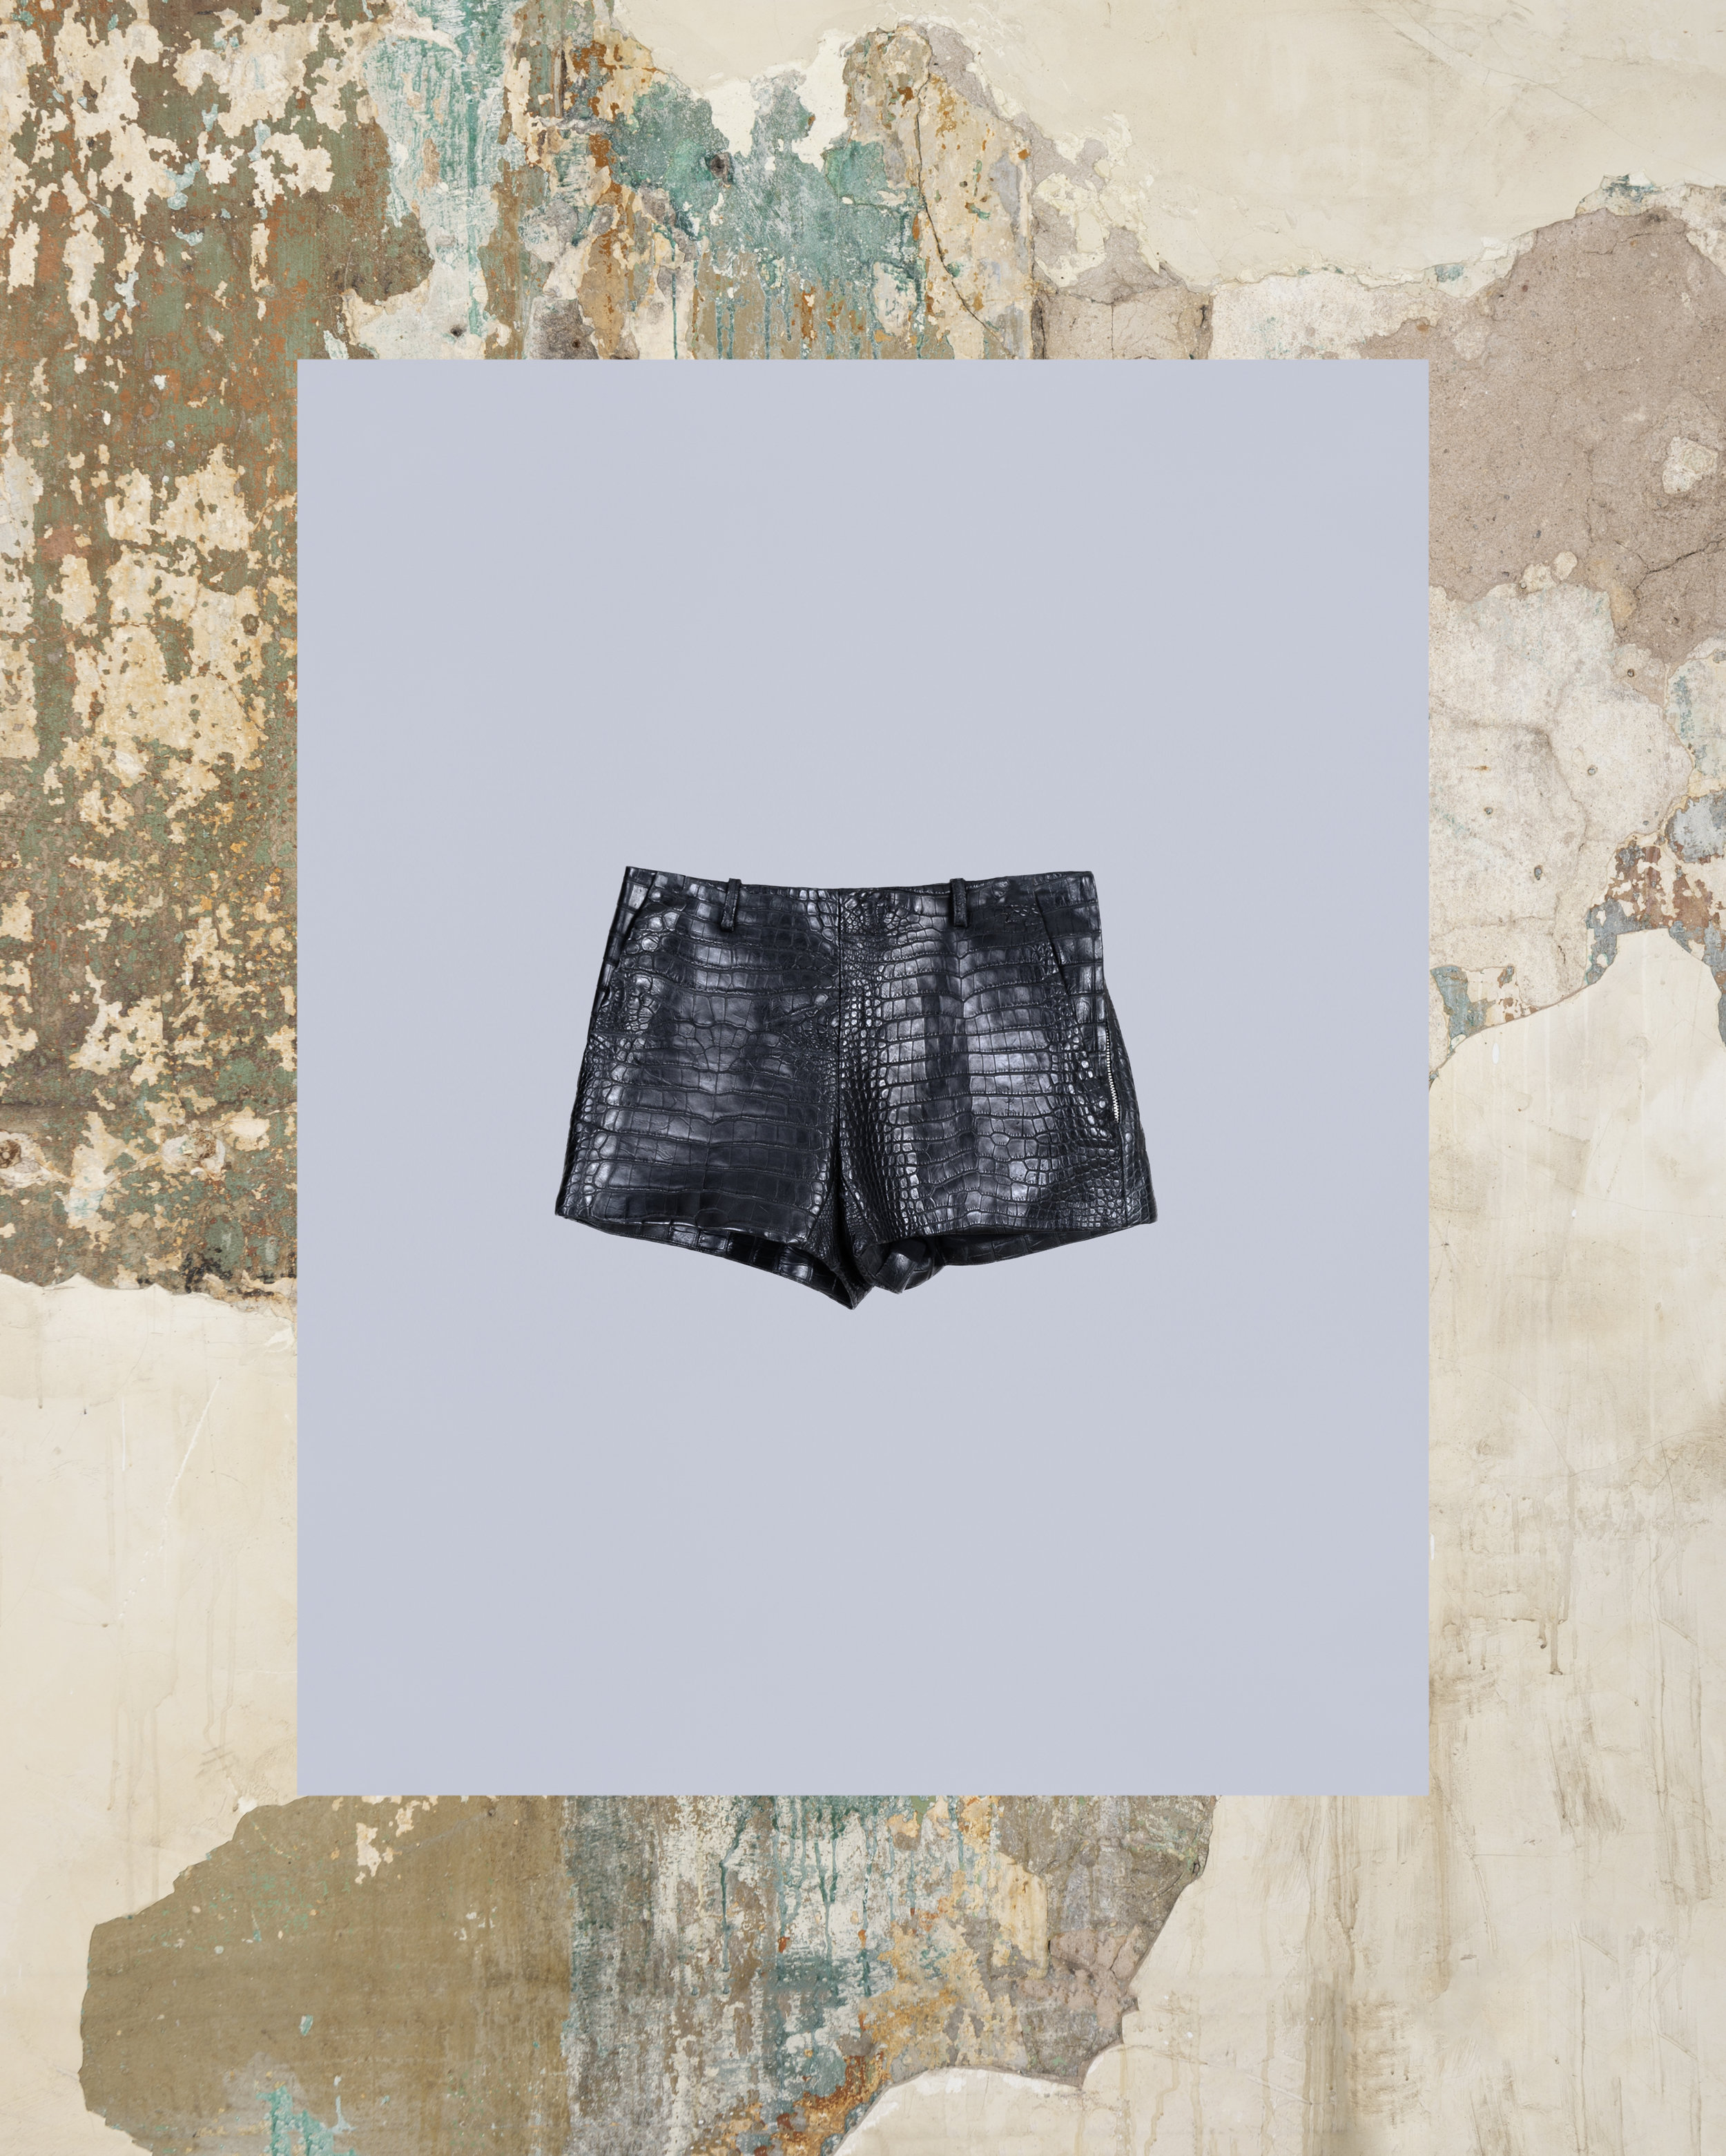 Gator_w_shorts_front.jpg